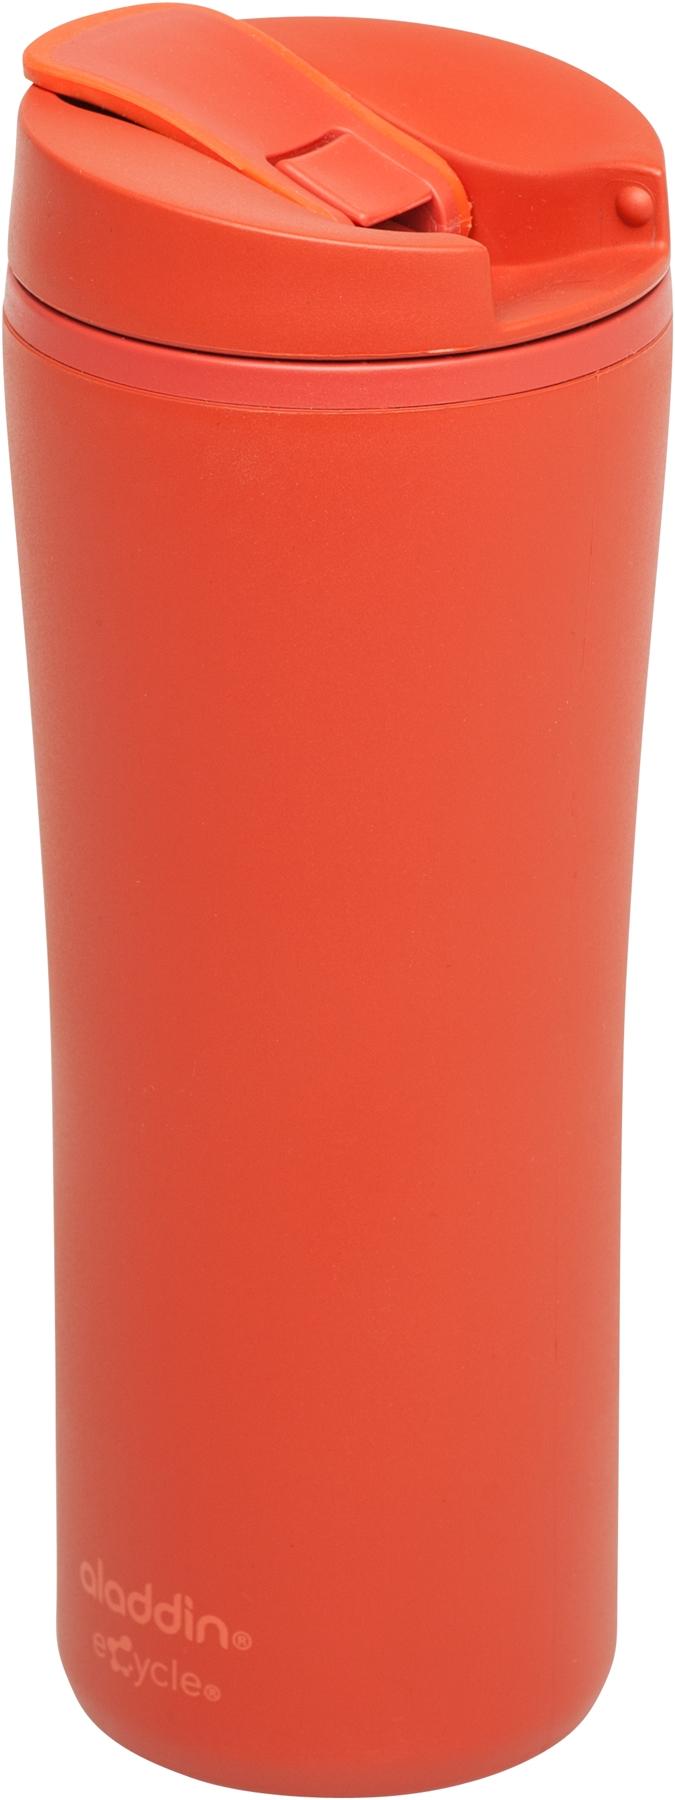 Termohrnek aladdin Flip-Seal červený